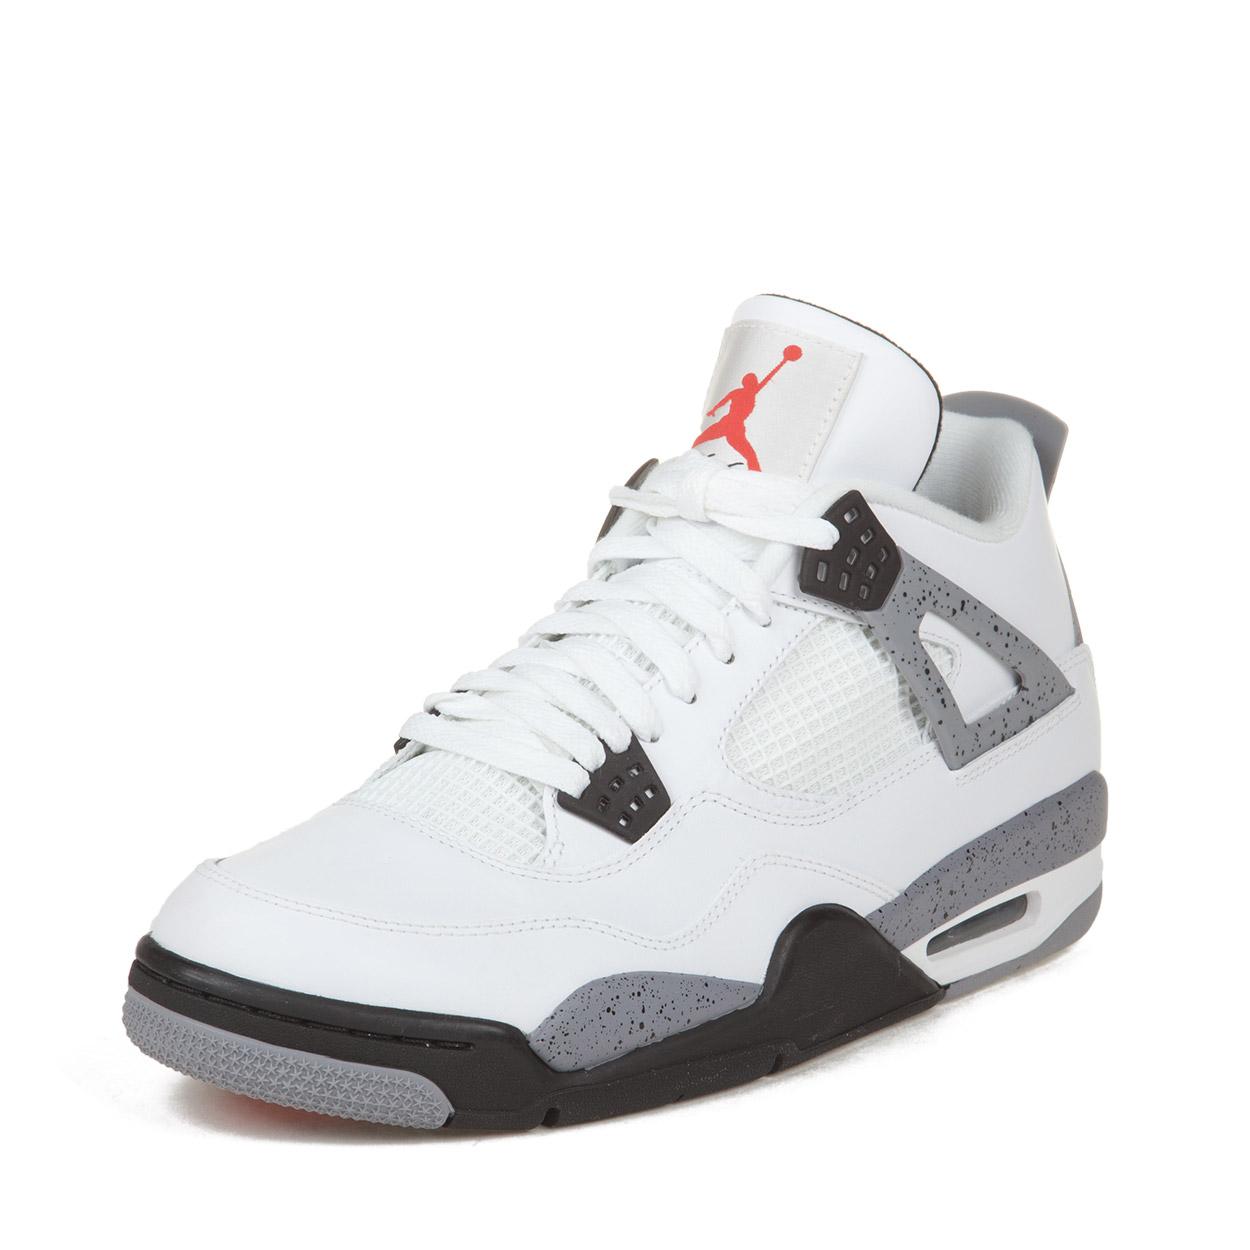 "Nike Mens Air Jordan 4 Retro ""White Cement"" White/Black-C..."